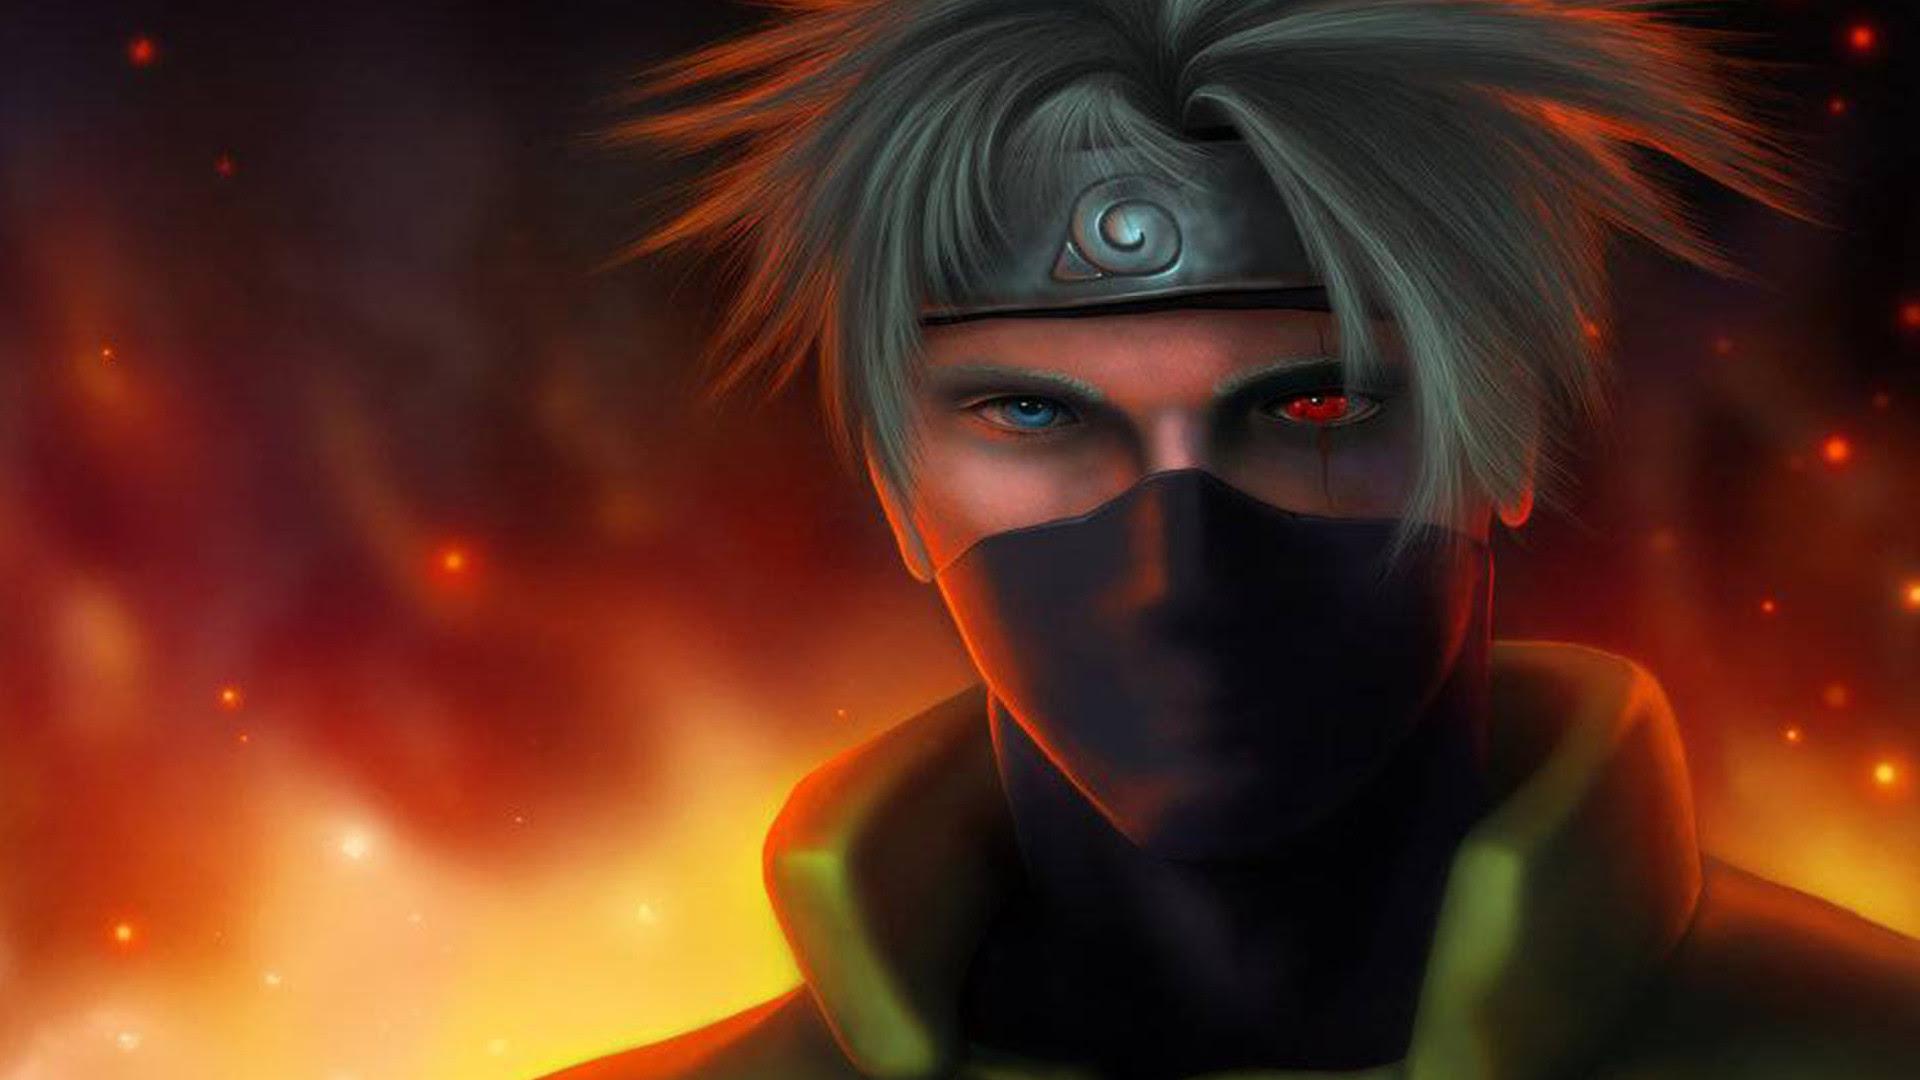 Unduh 82+ Wallpaper Naruto Keren 3d Terbaik